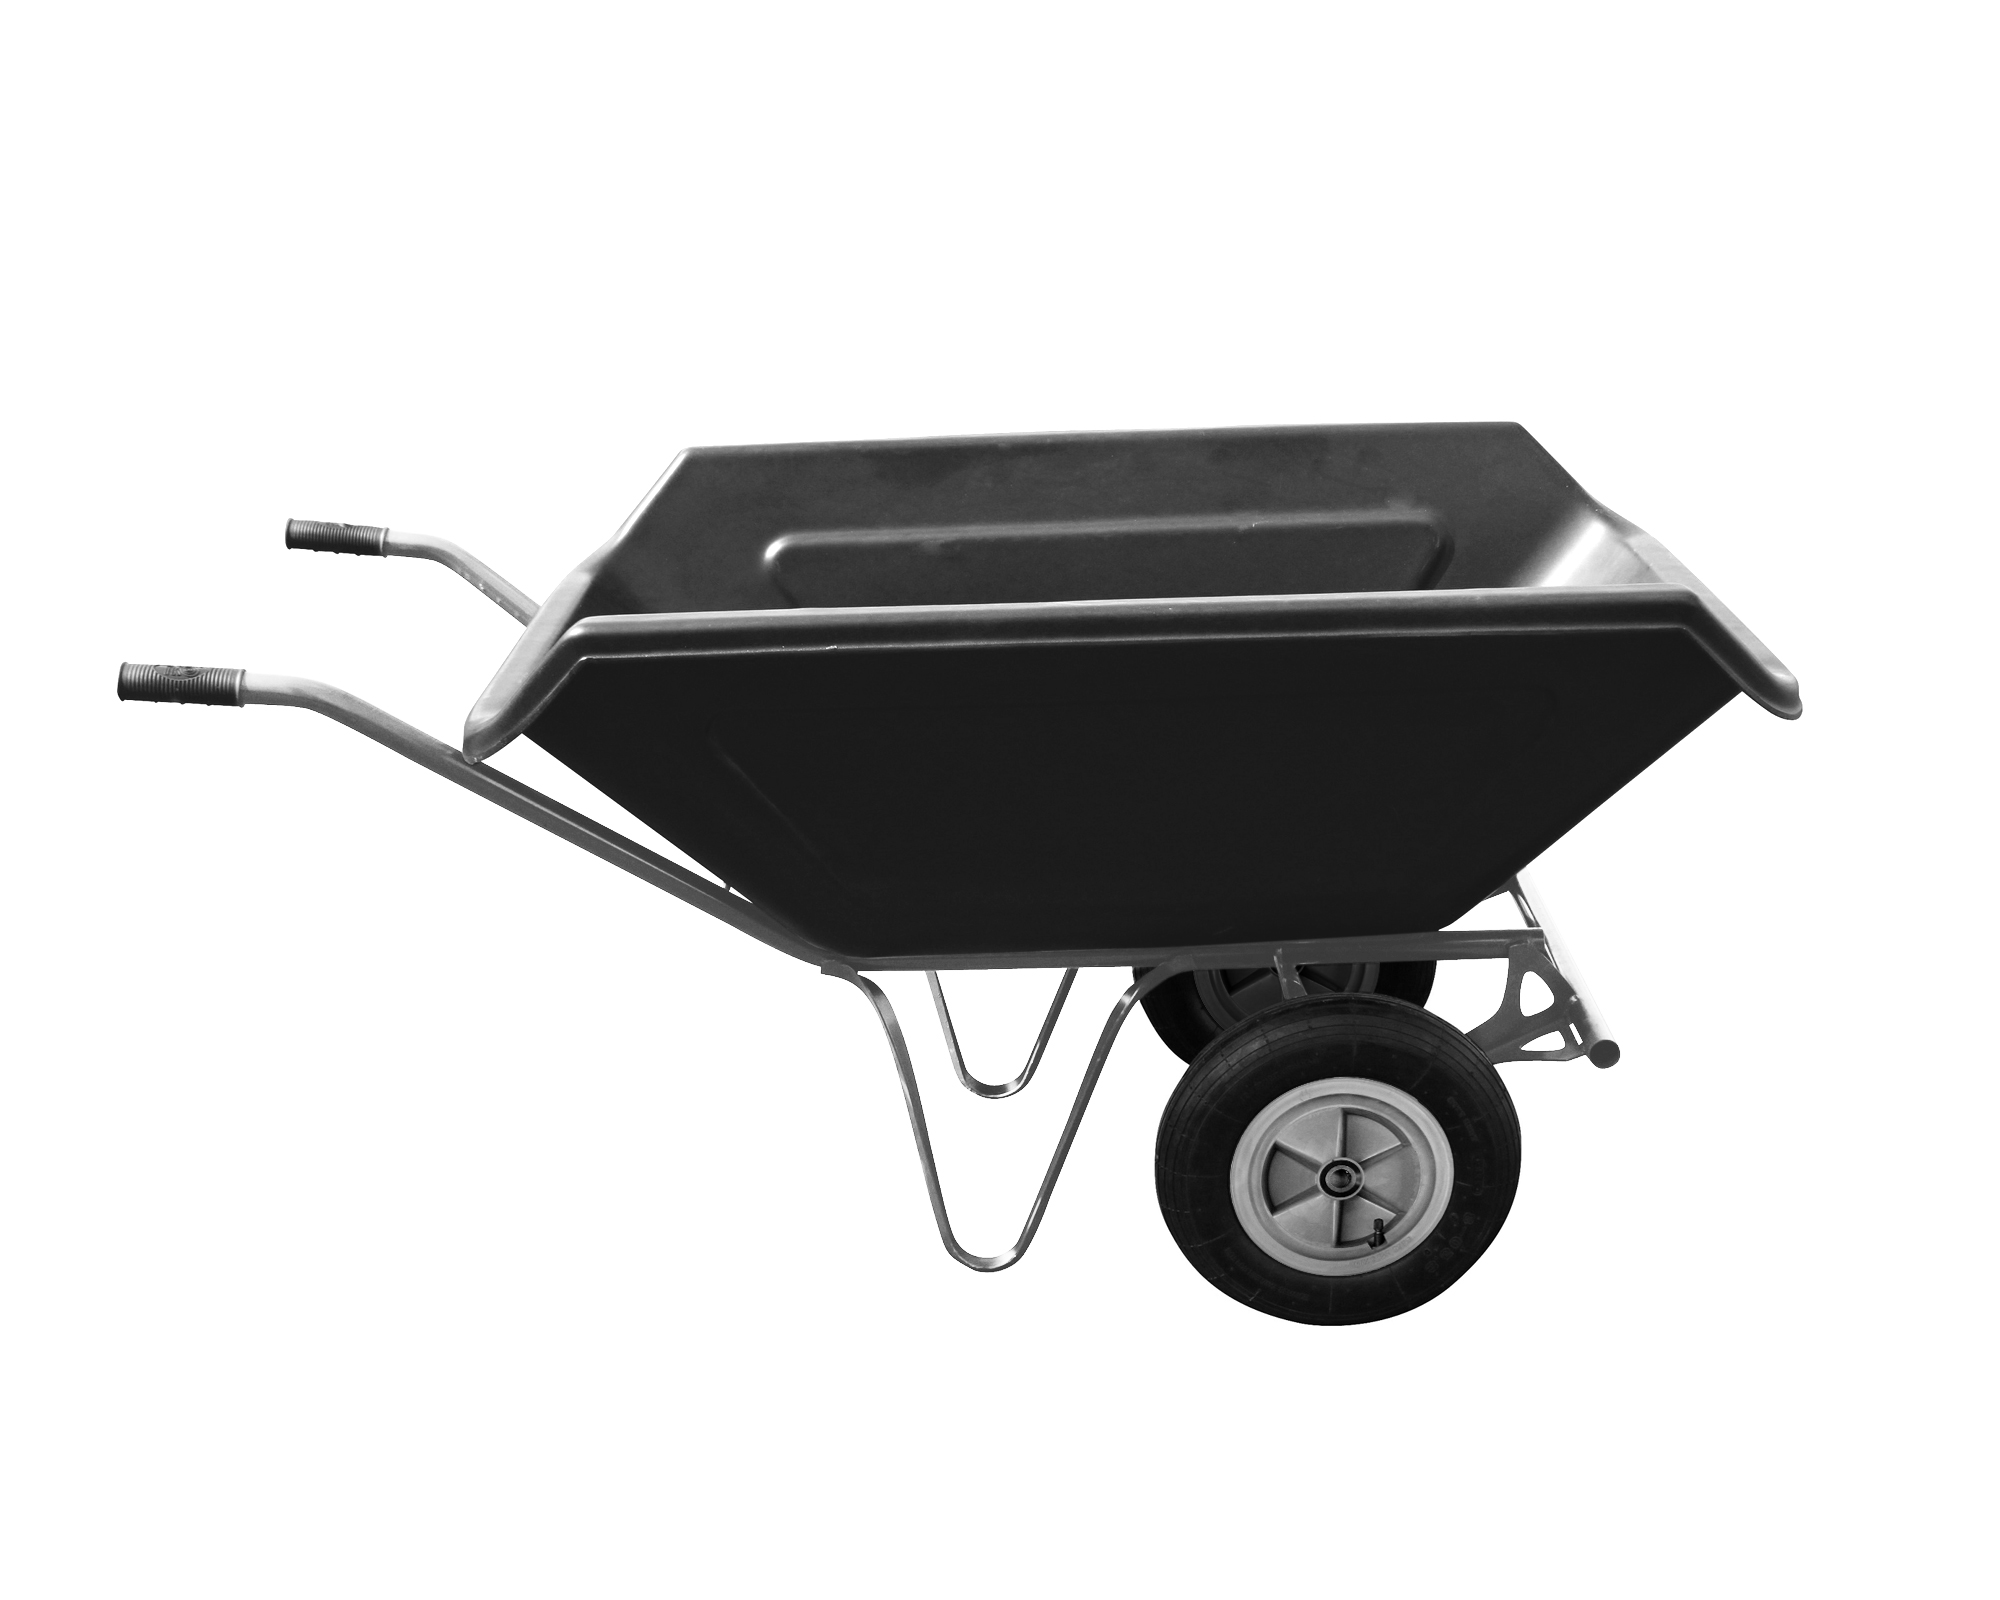 ondis24 bauschubkarre transportkarre zweirad schubkarre xl. Black Bedroom Furniture Sets. Home Design Ideas